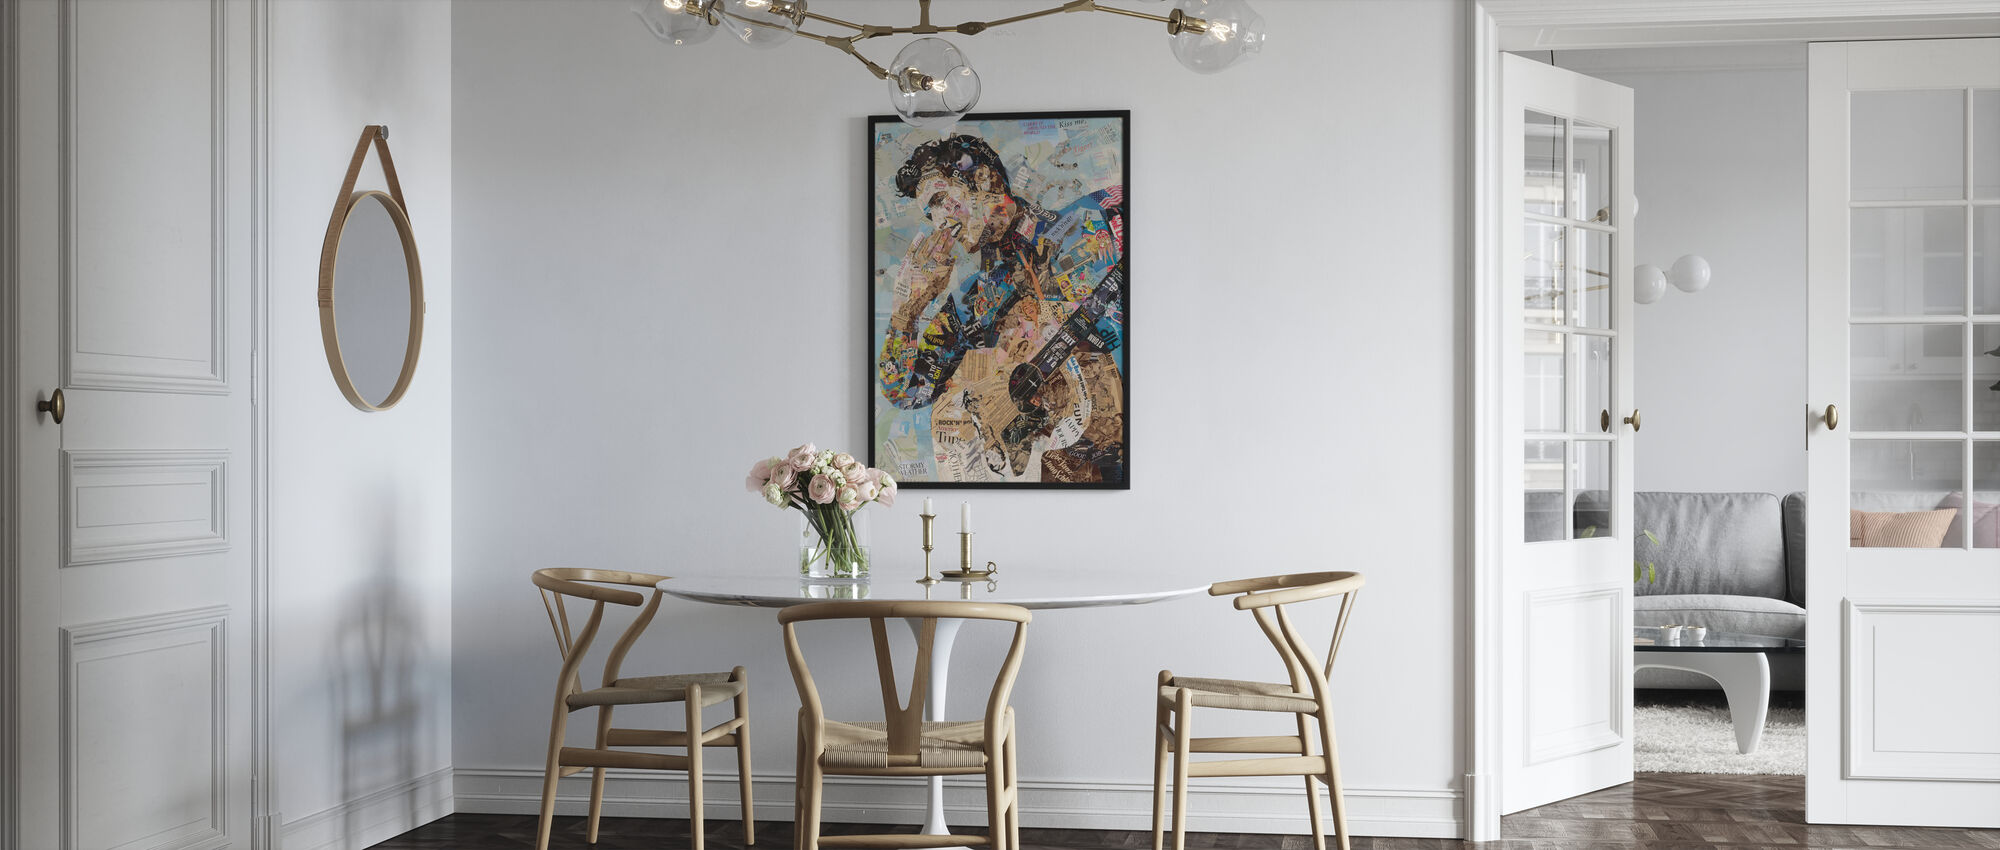 All Shook Up - Poster - Kitchen